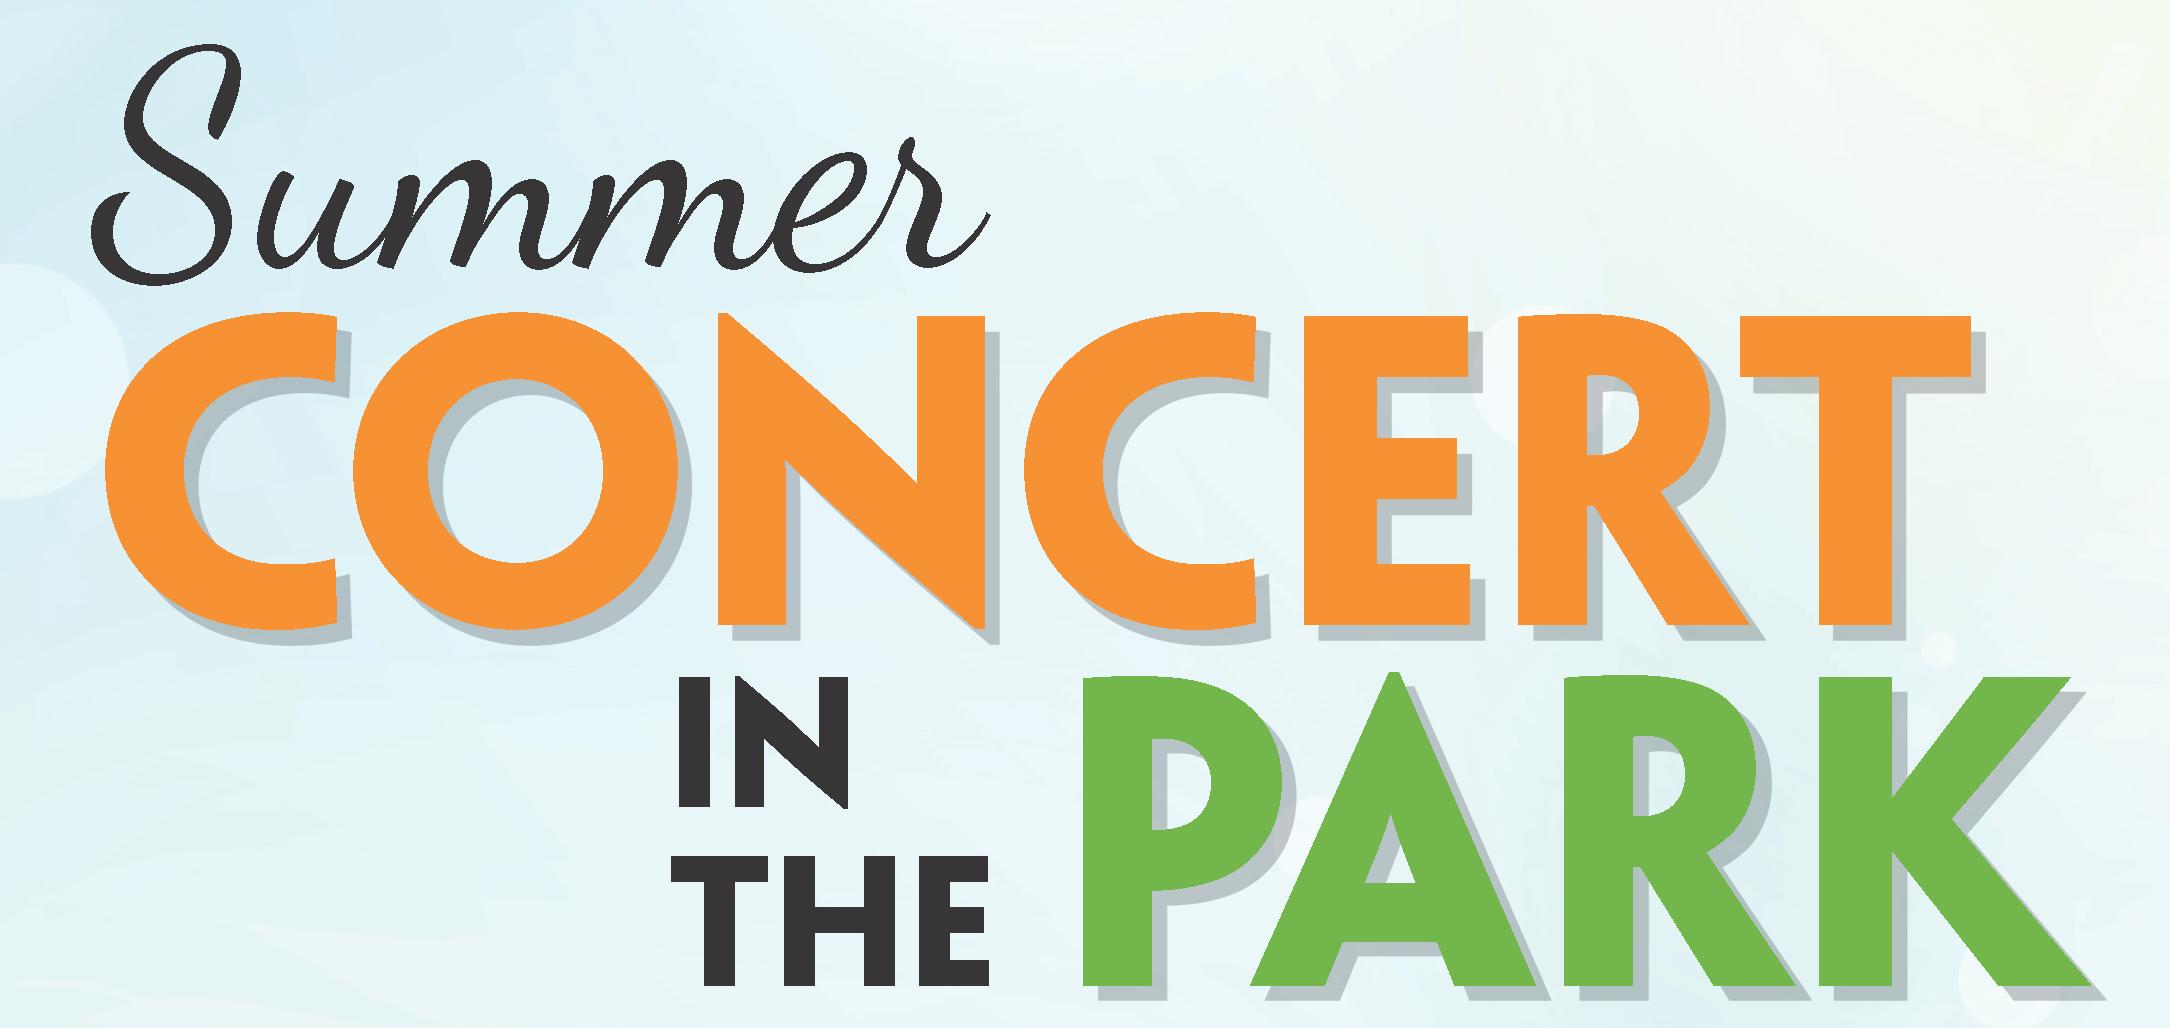 a8e38878d4f7bc40251a_Summer_Concert_In_The_Park.jpg